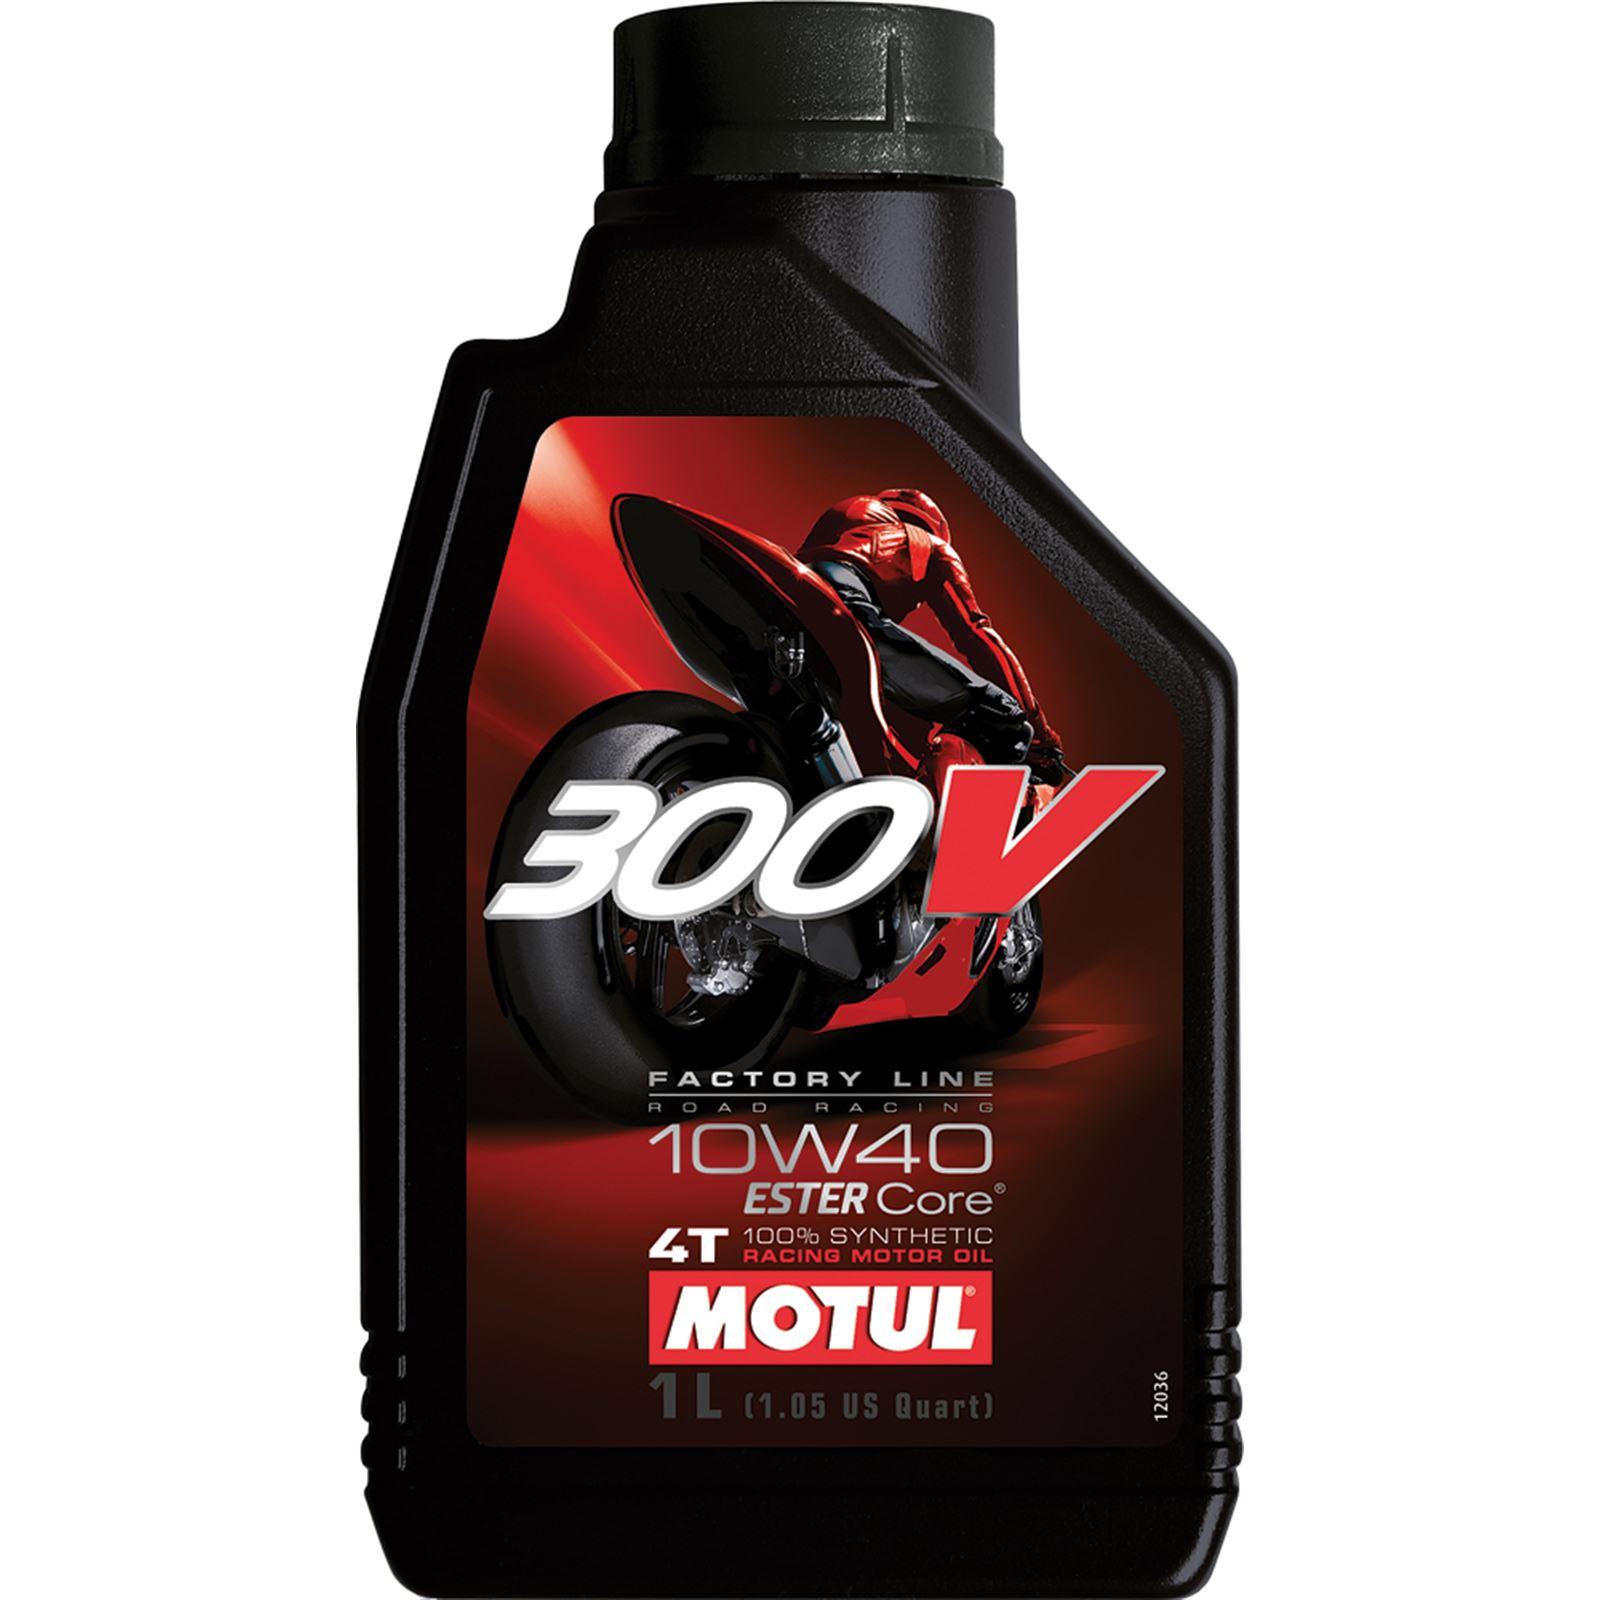 Motul 300V Road 4T Oil